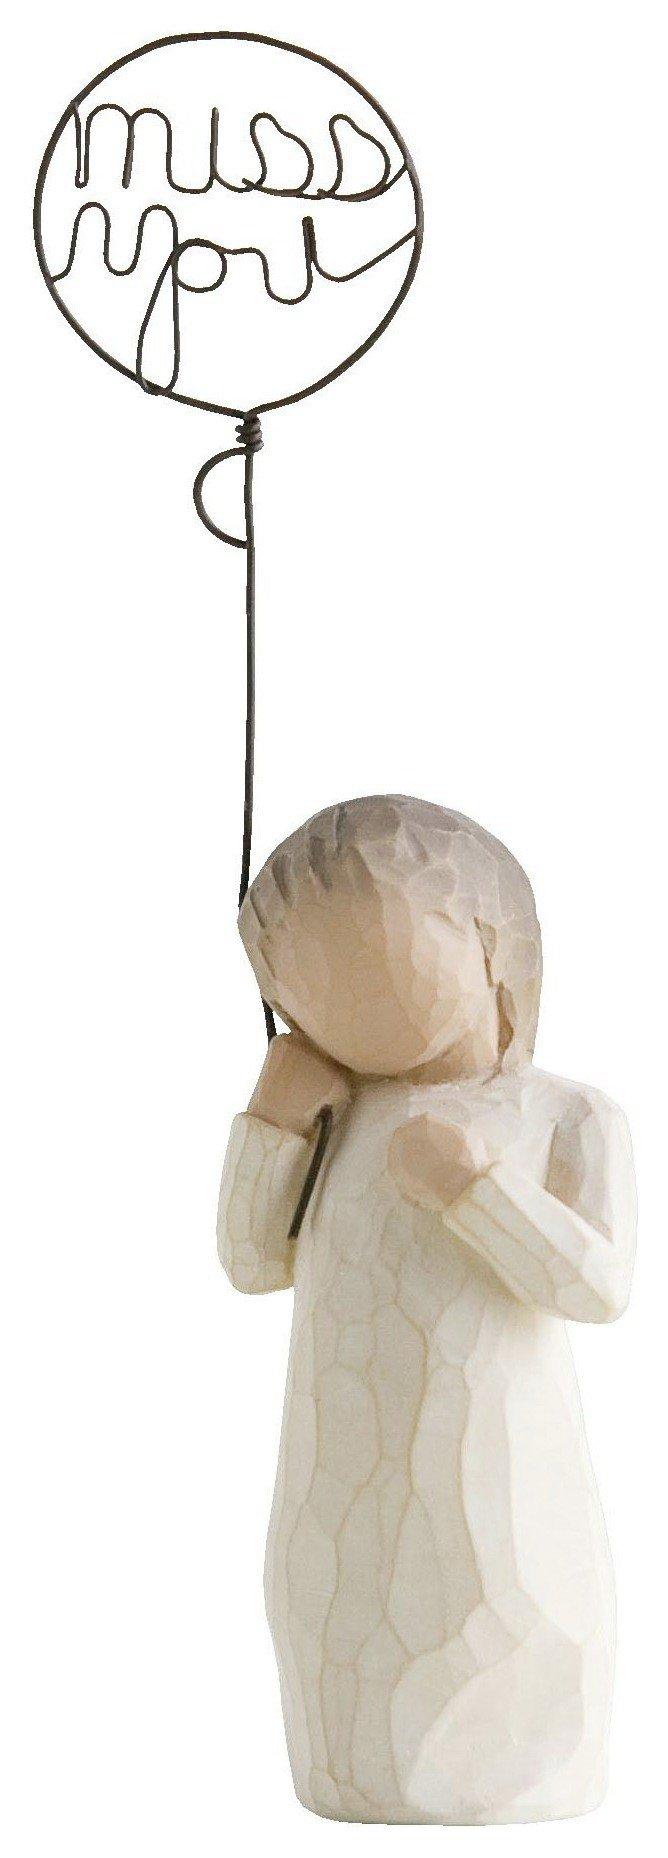 Willow Tree - Miss You - Figurine lowest price